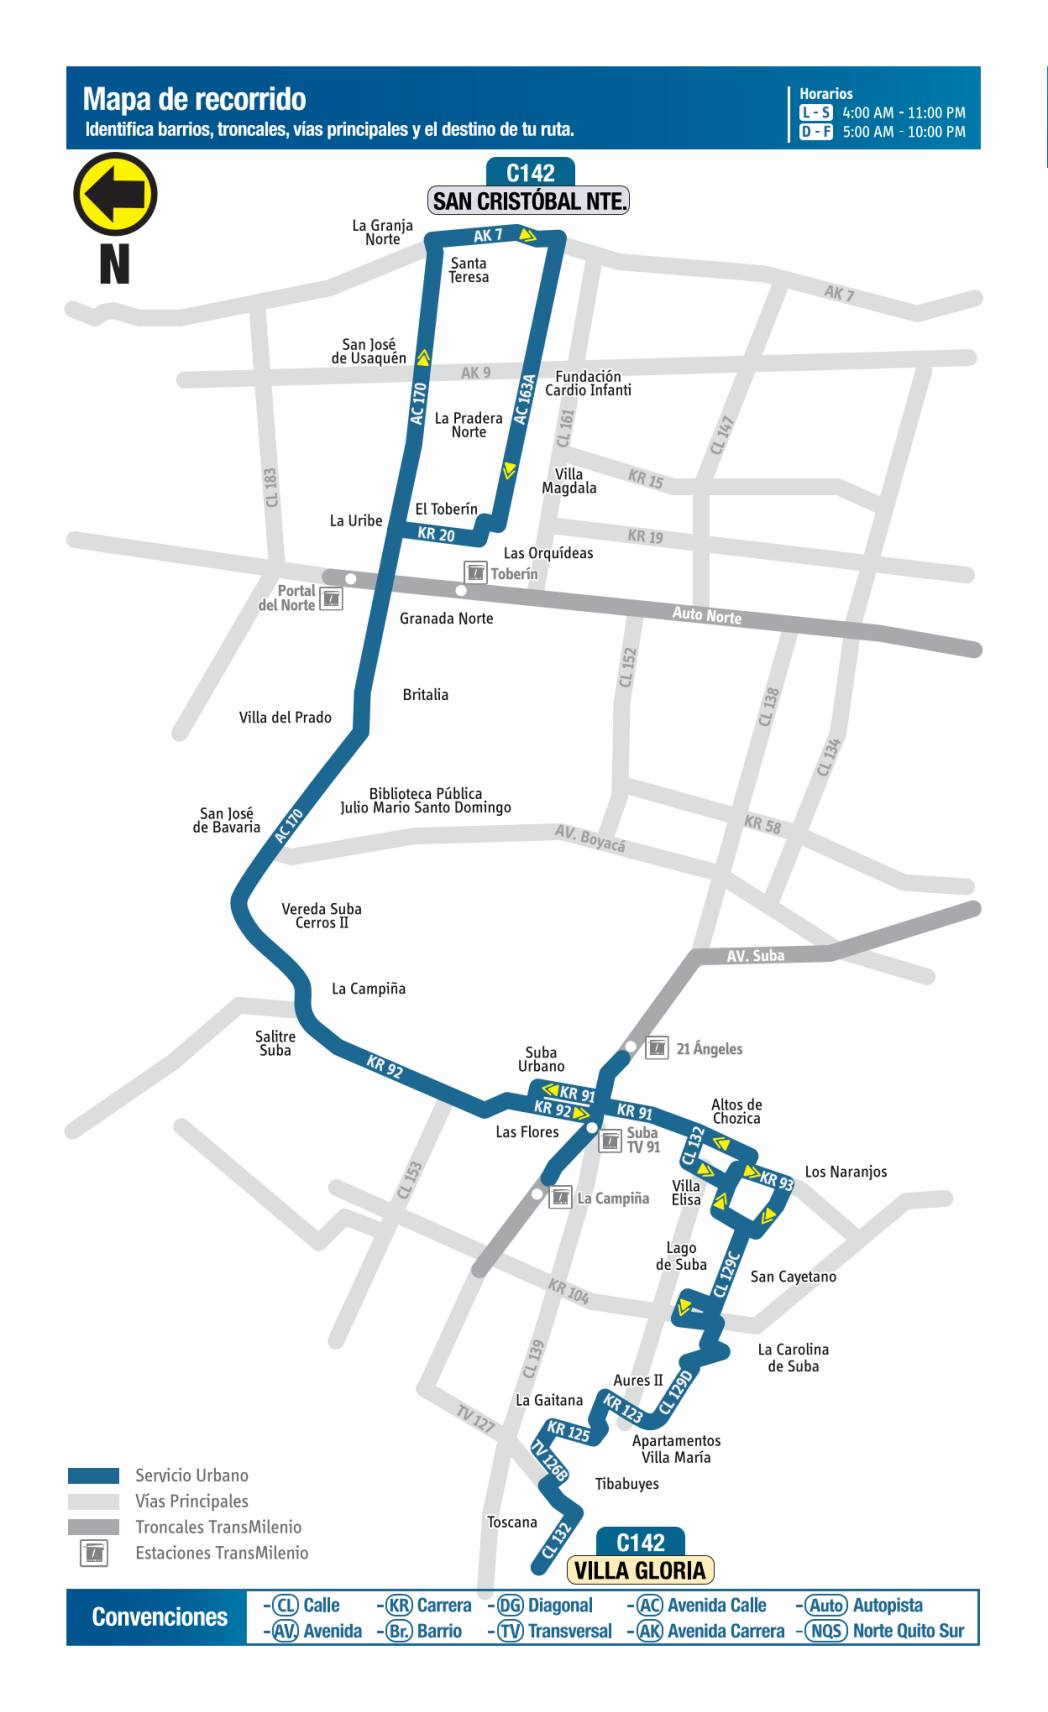 C142 Villa Gloria - San Cristóbal Norte, mapa bus urbano Bogotá